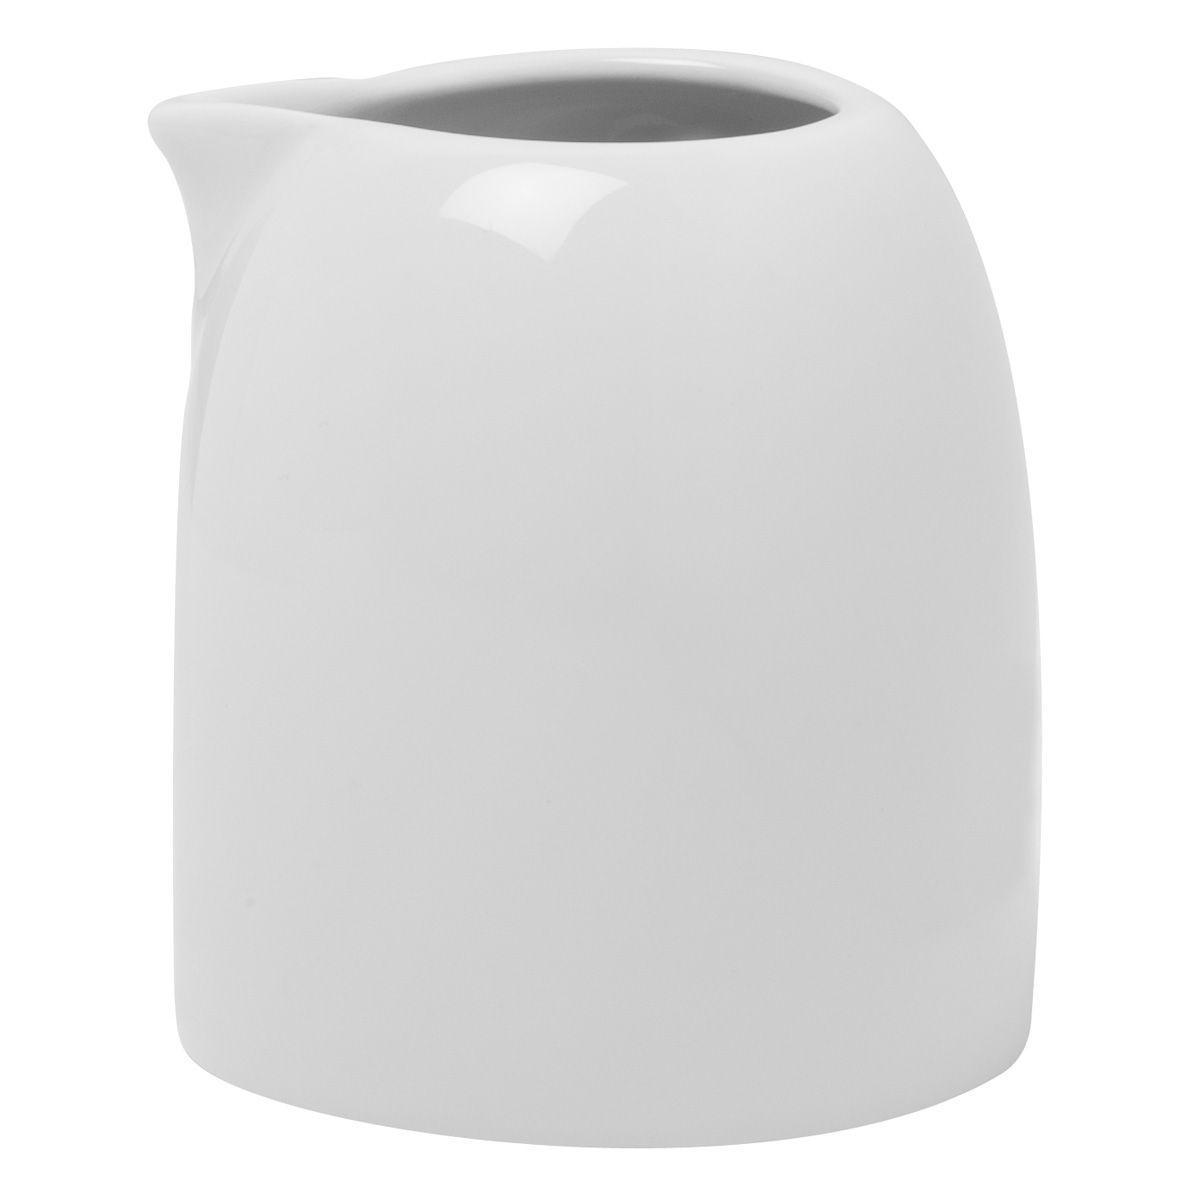 Salam Ceramic creamer in white